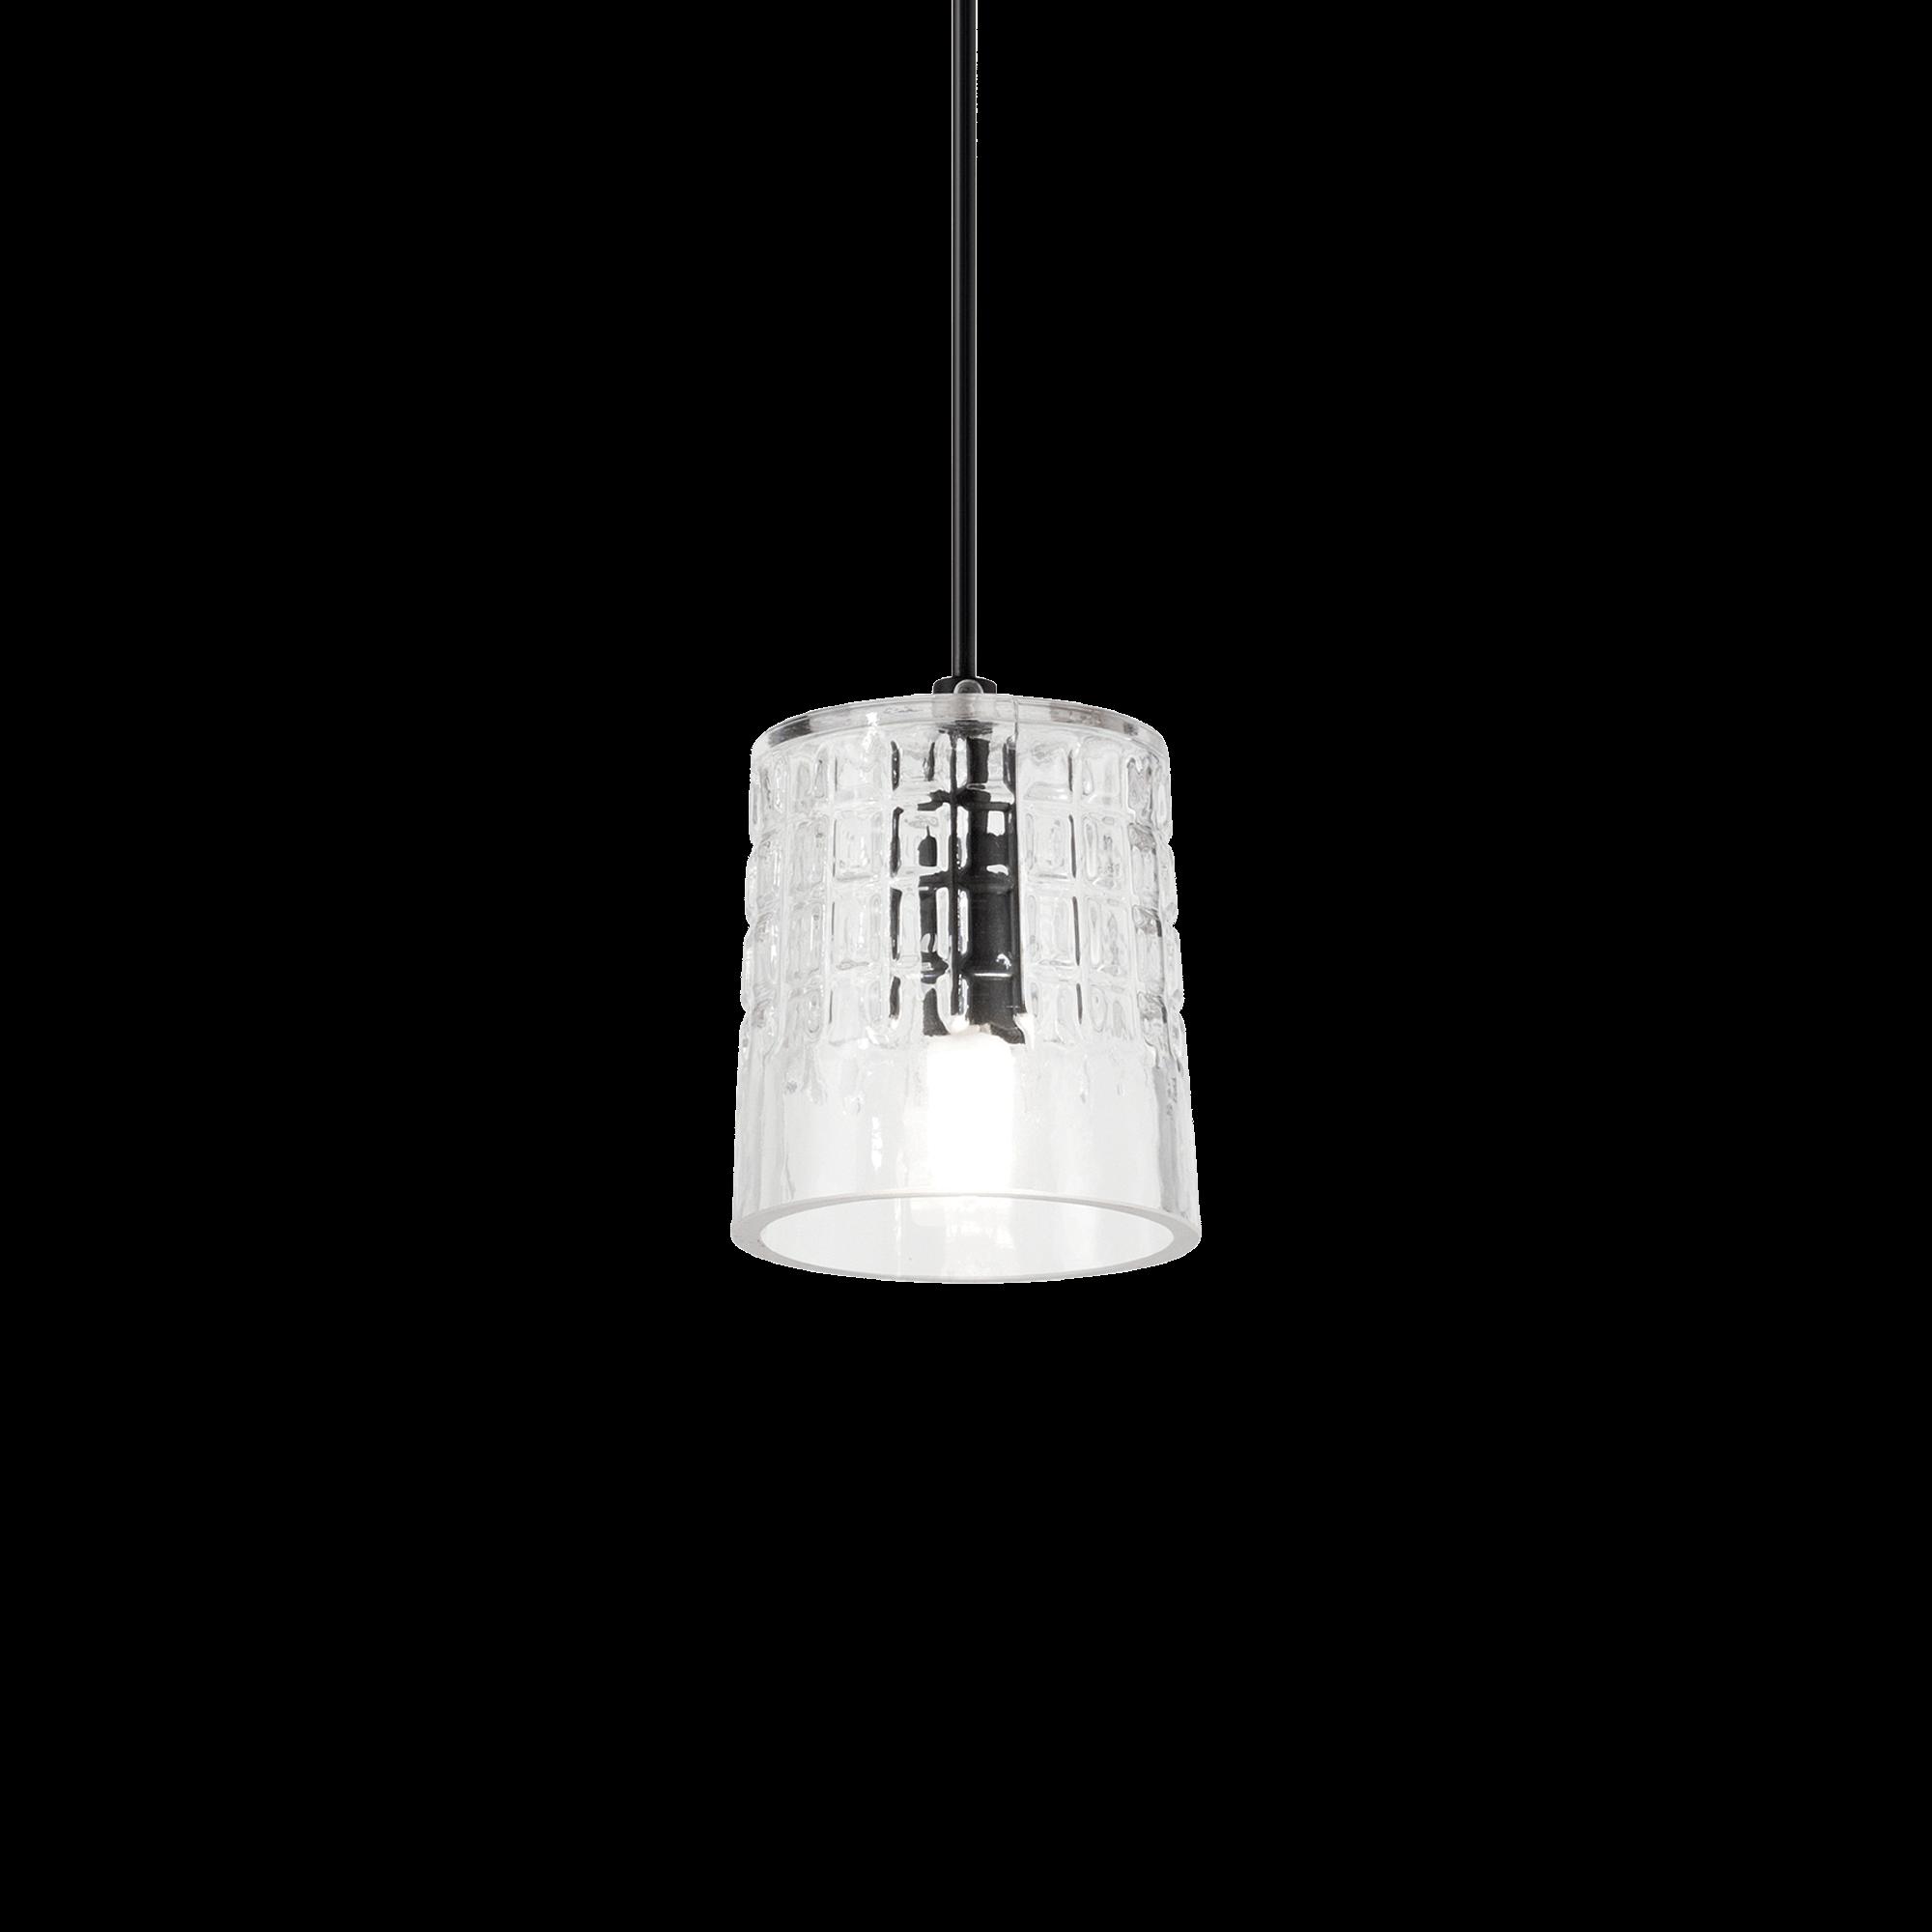 Ideal Lux 166988 COGNAC-1 SP1 lámpa függeszték